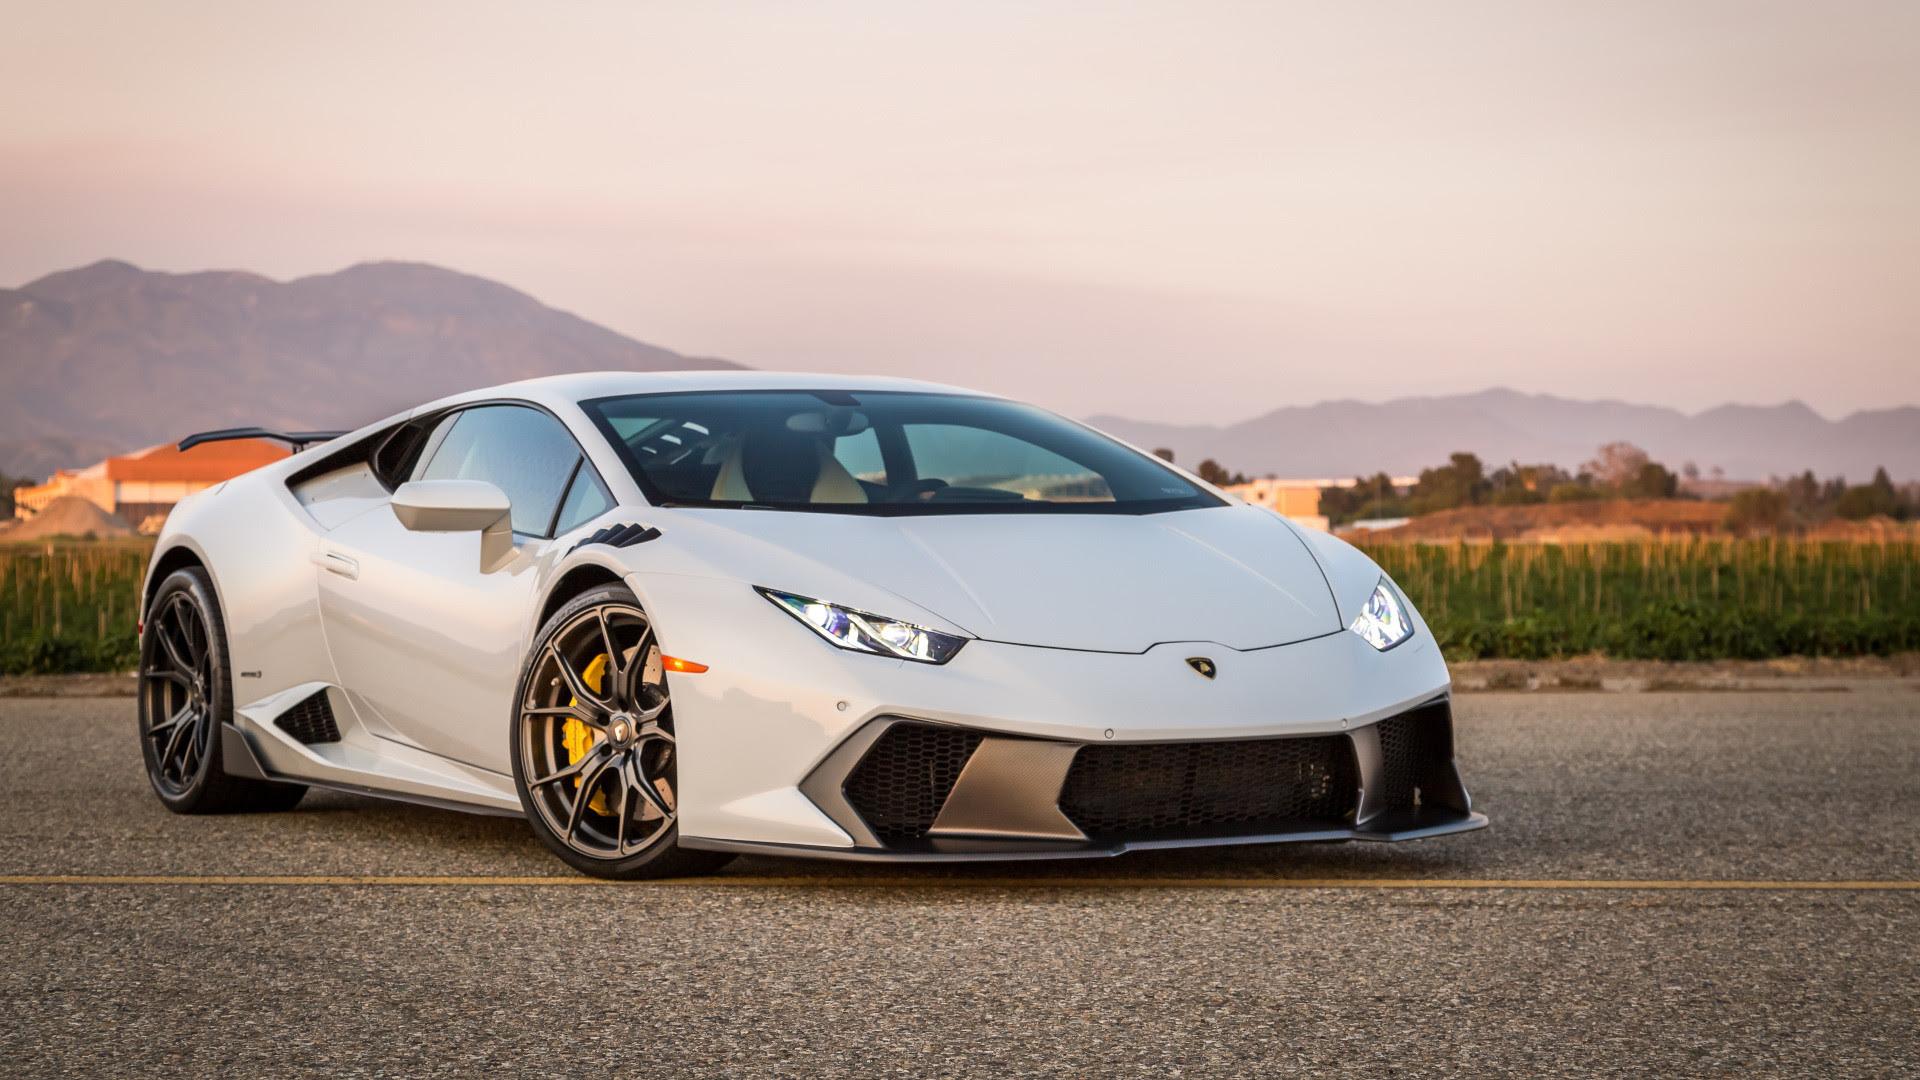 Lamborghini Backgrounds 62 Images